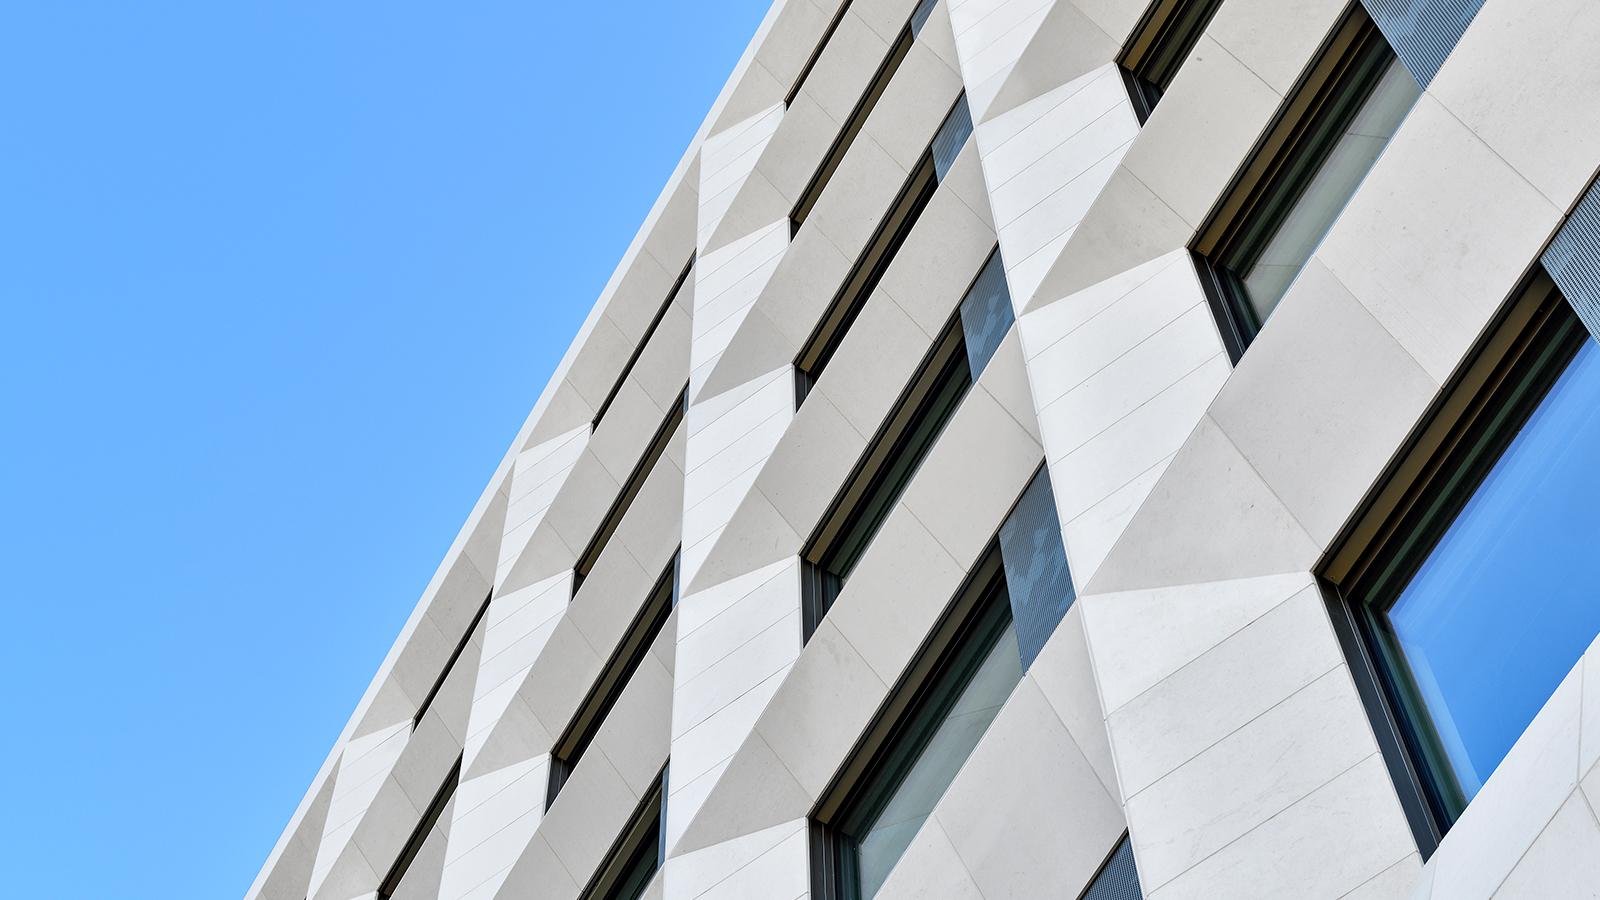 h2m-architekten-fassade-klinikum-kulmbach-fertiggestellt-detail